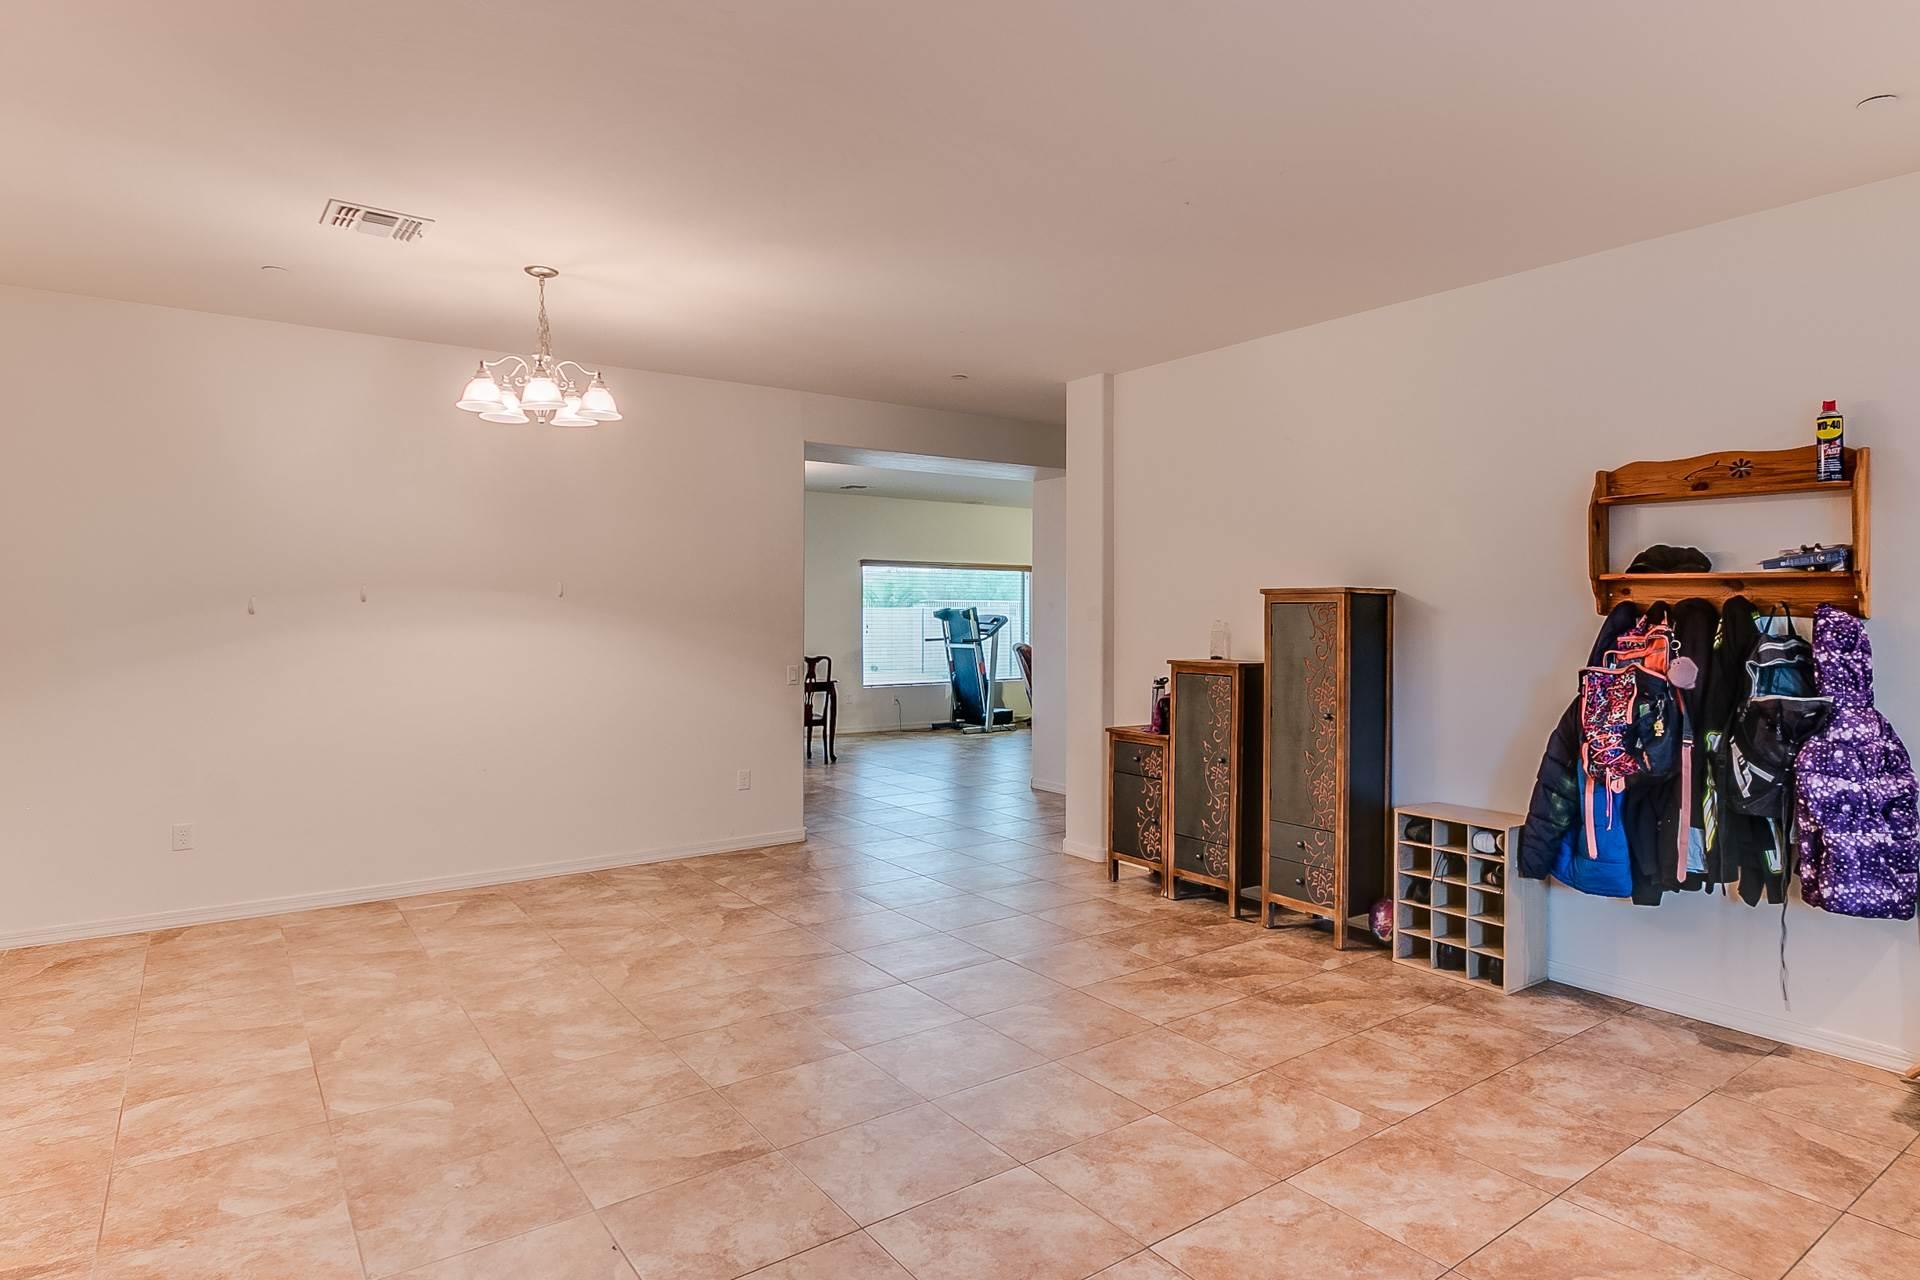 635 W Calle Sombra Linda, Sahuarita, AZ 85629